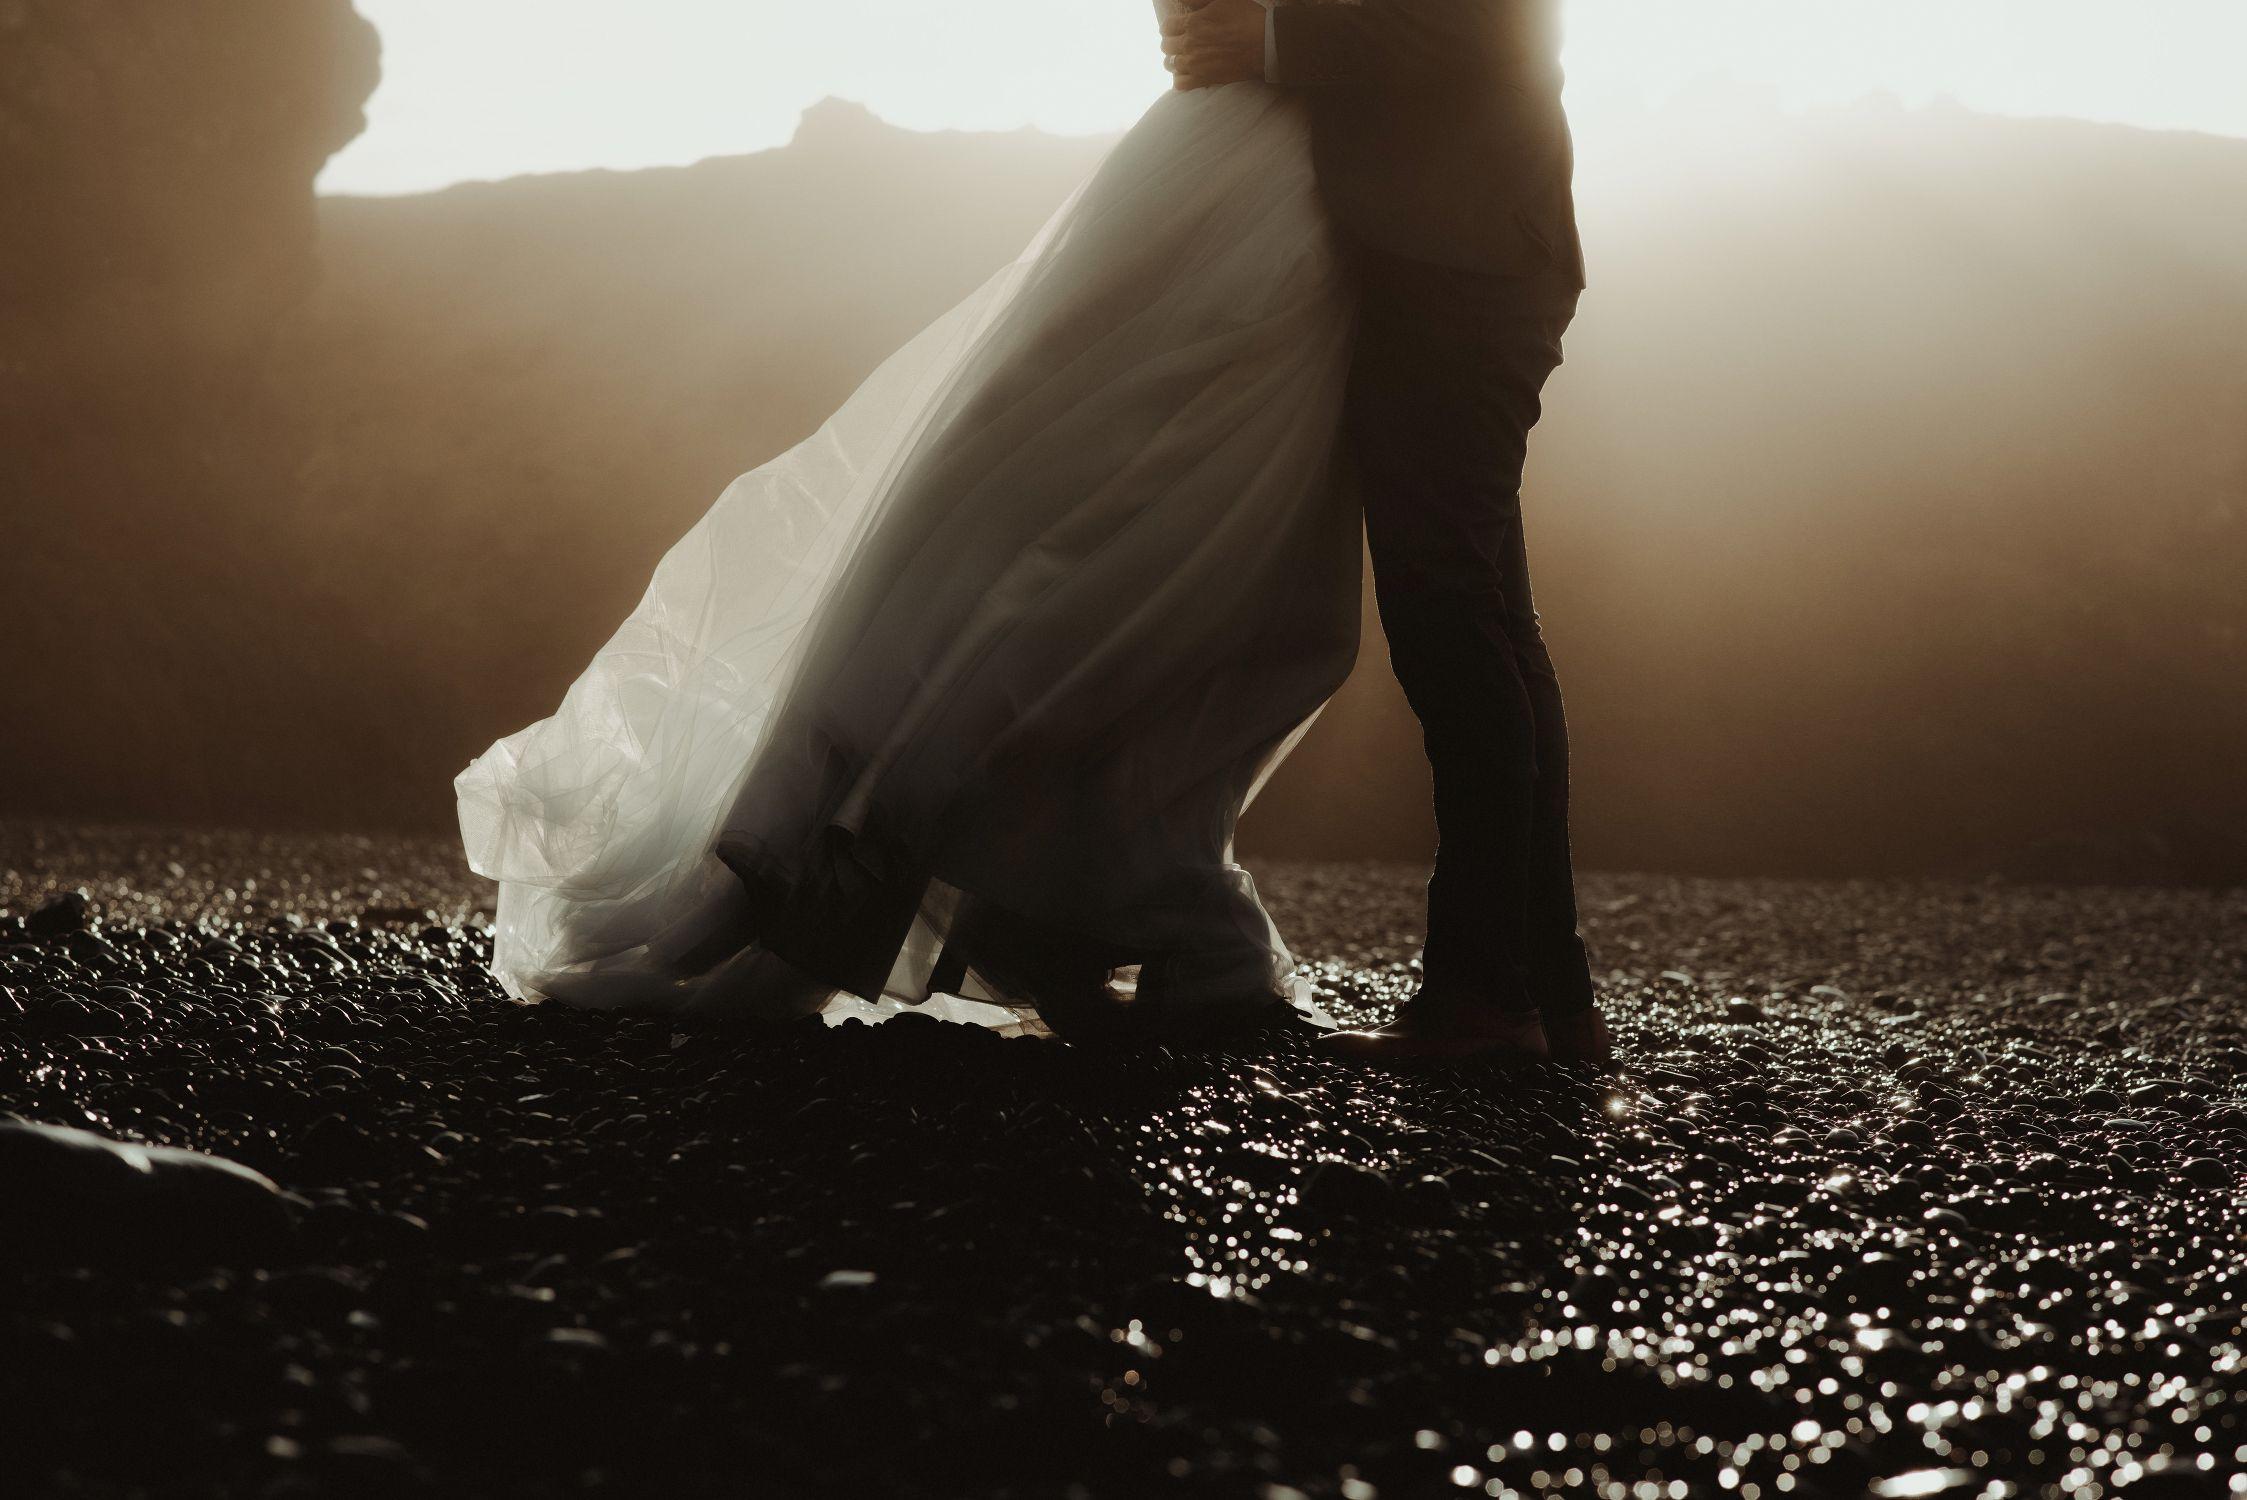 Snaefellsnes wedding dress in the wind